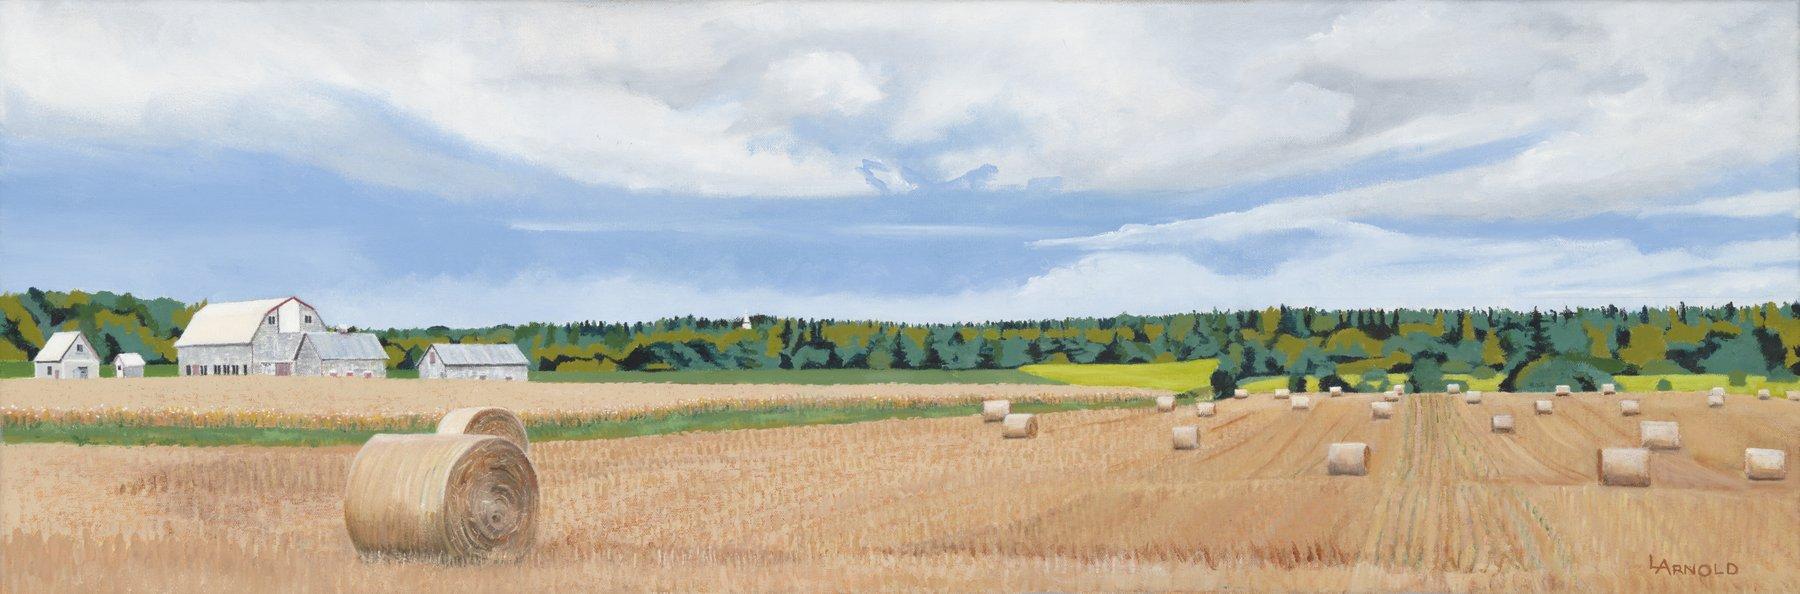 PEI Farm With Hay Bales